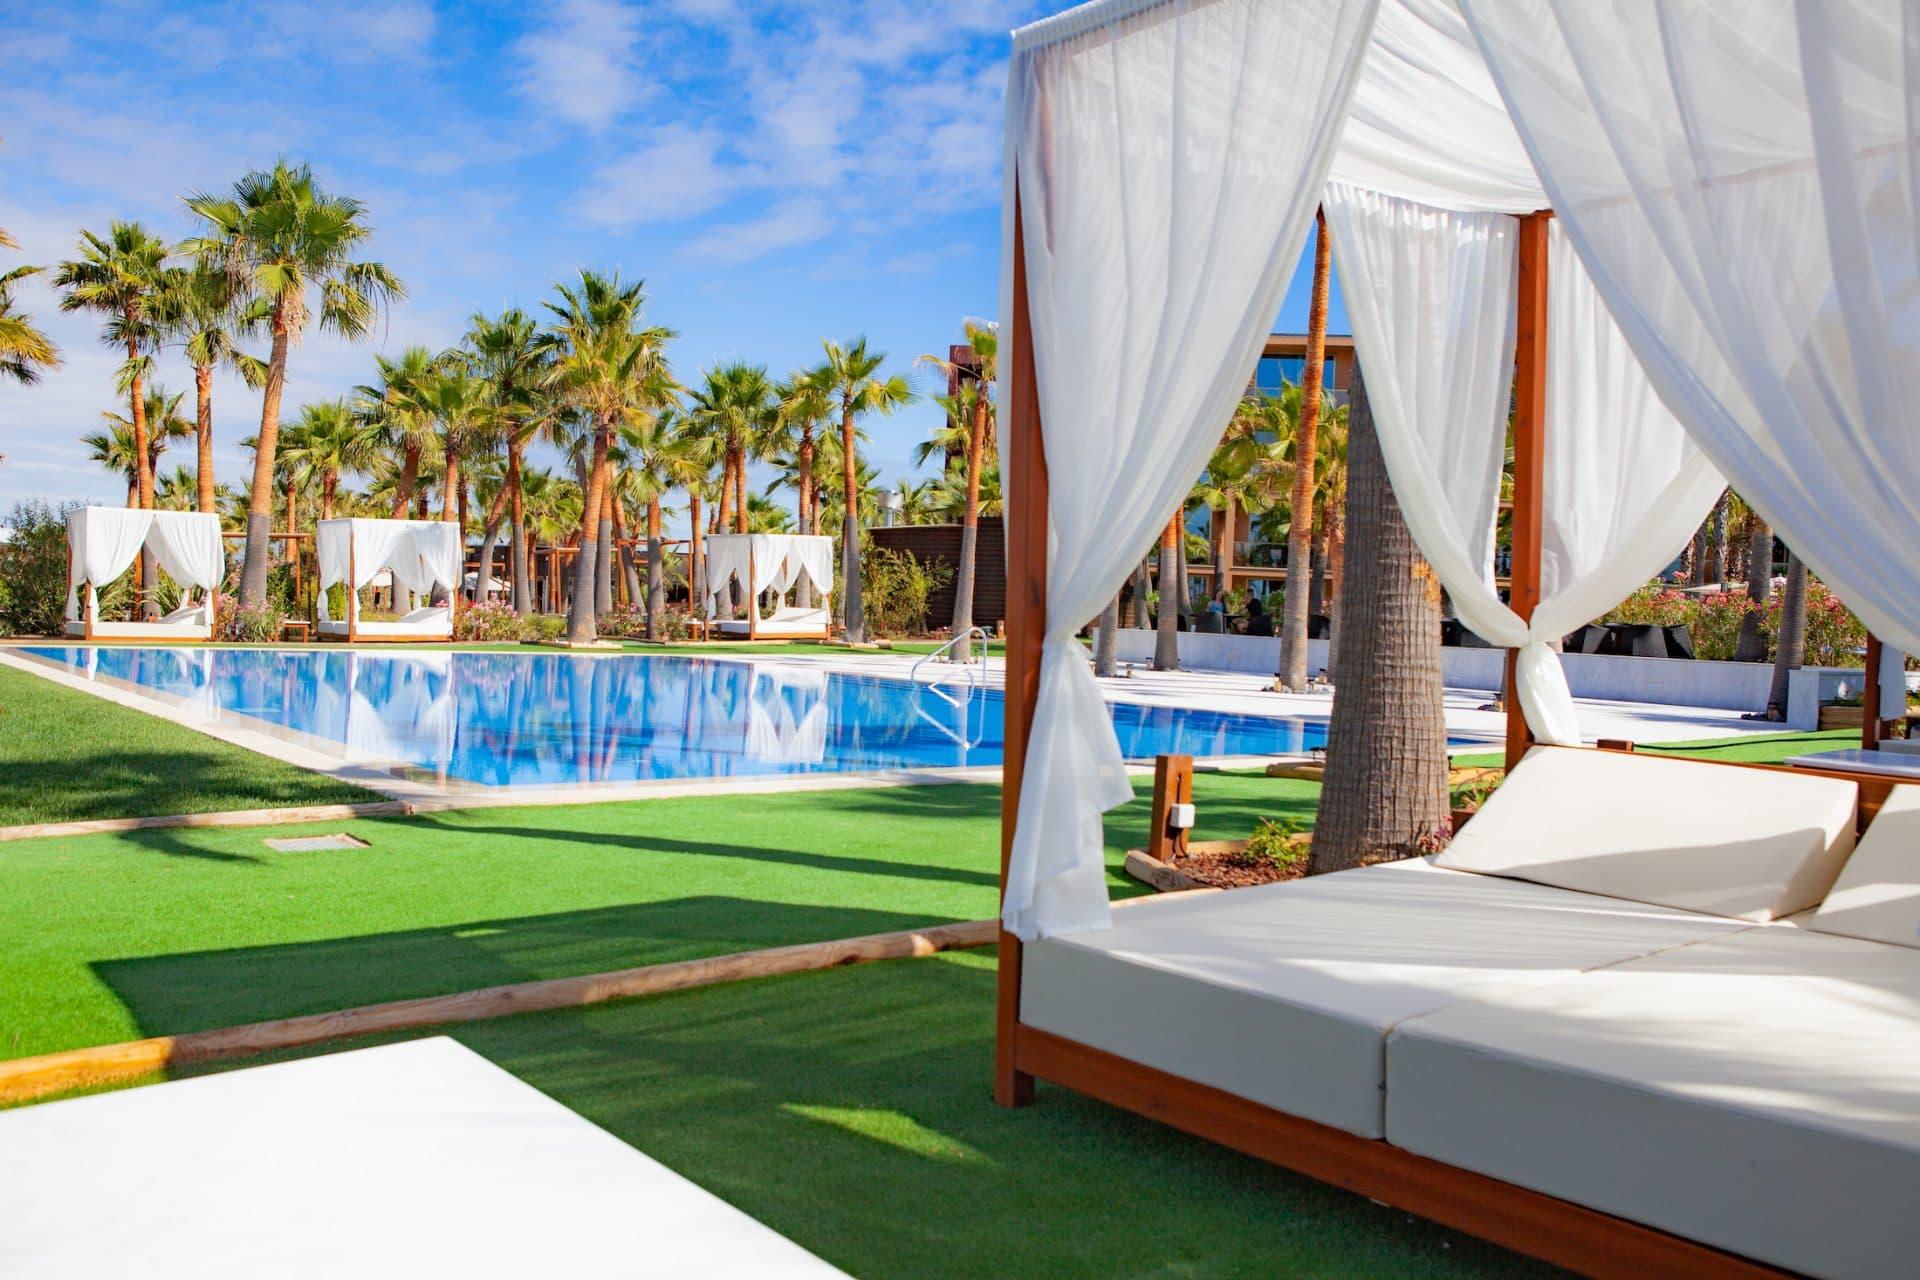 marclub-vidamar-hotels-resorts-algarve-2